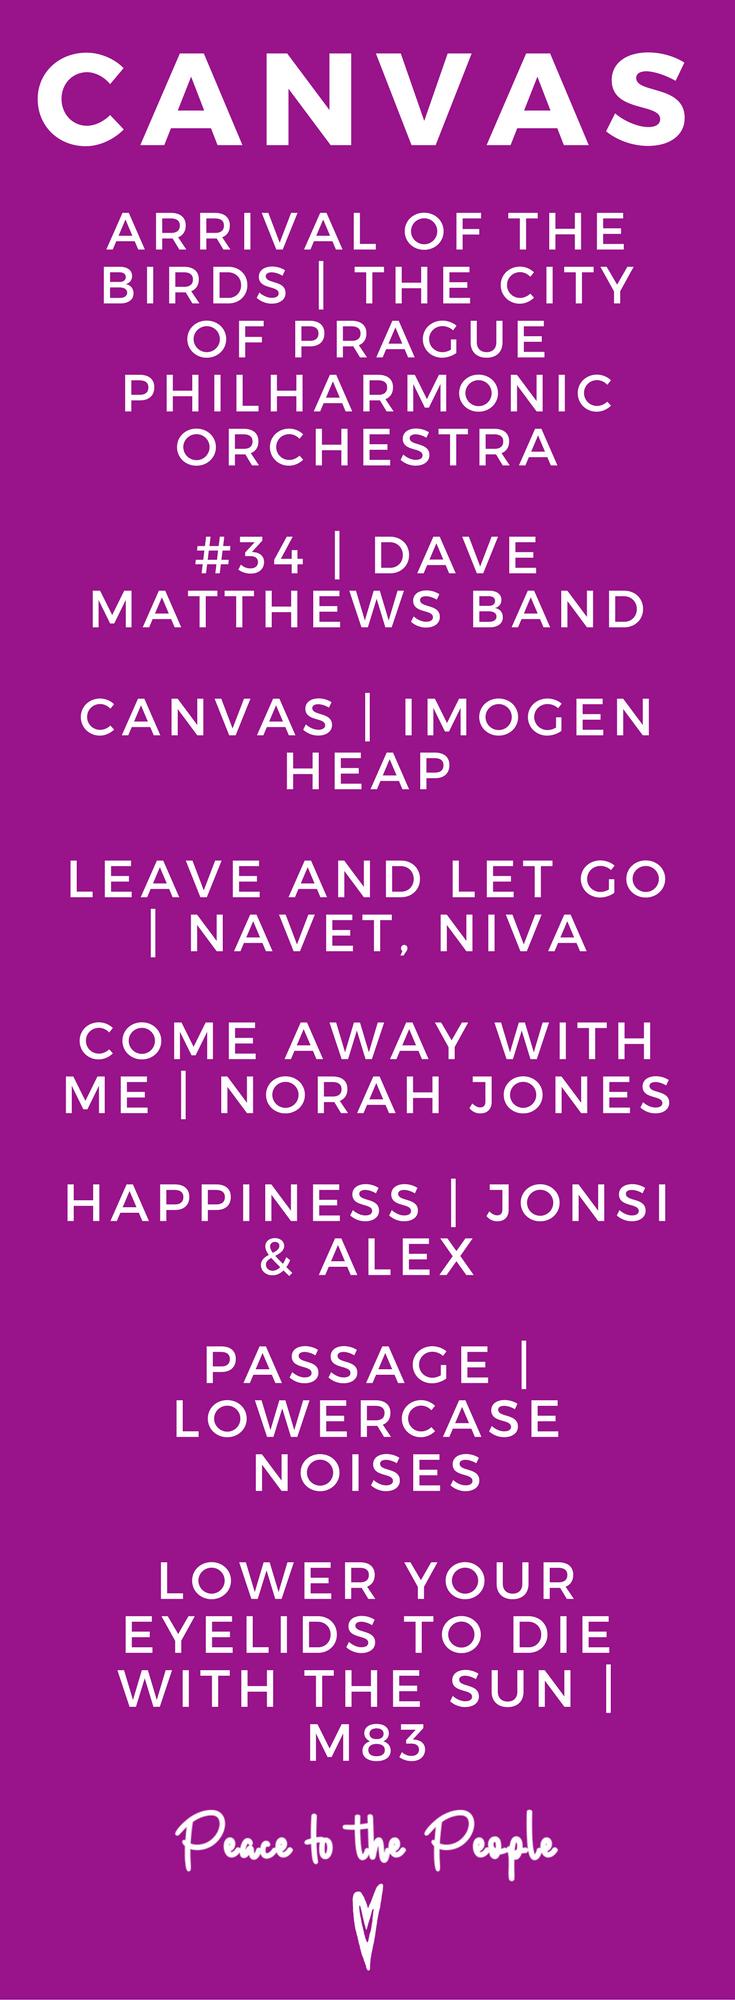 Canvas Gentle Relaxing Yoga Playlist Yin Vinyasa Imogen Heap Norah Jones Beautiful.png